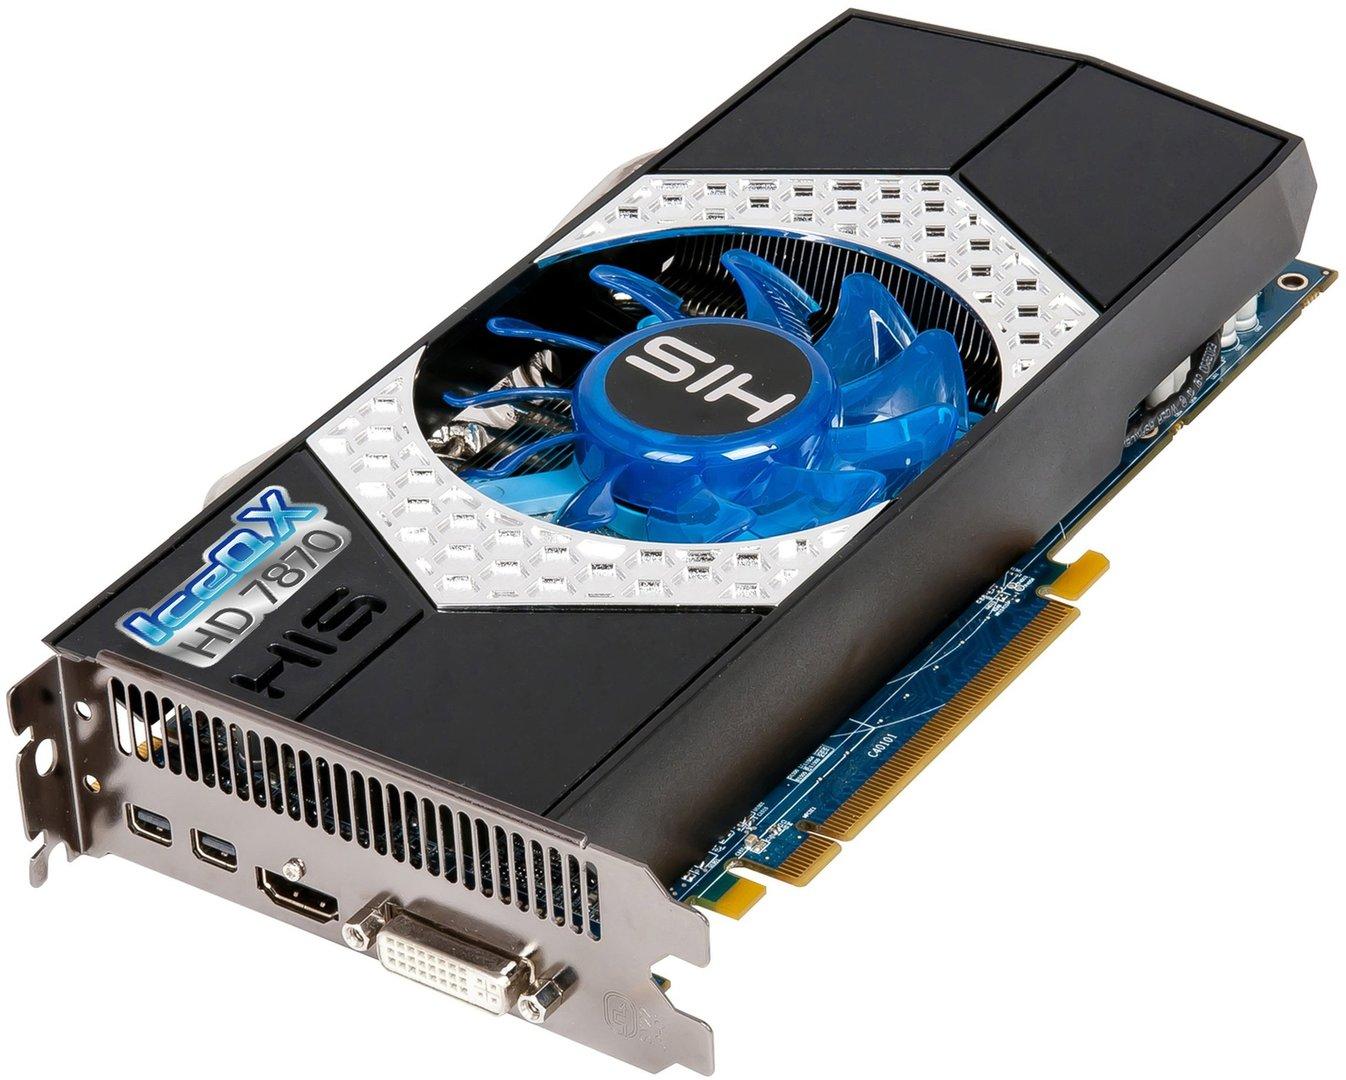 HIS Radeon IceQ X 7870 2 GB